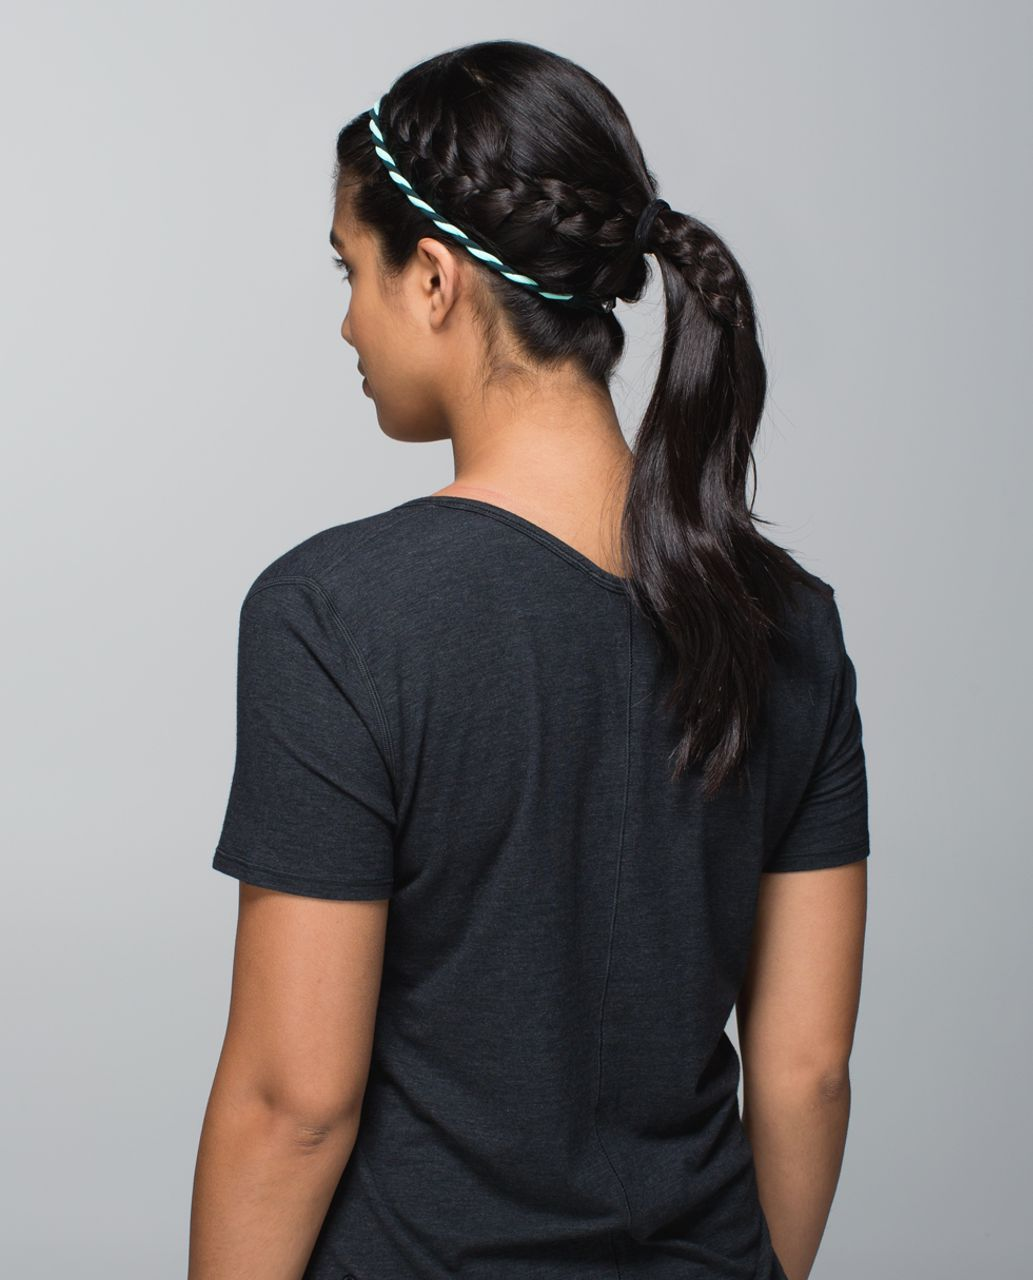 Lululemon Charming Twist Headband - Fuel Green / Toothpaste